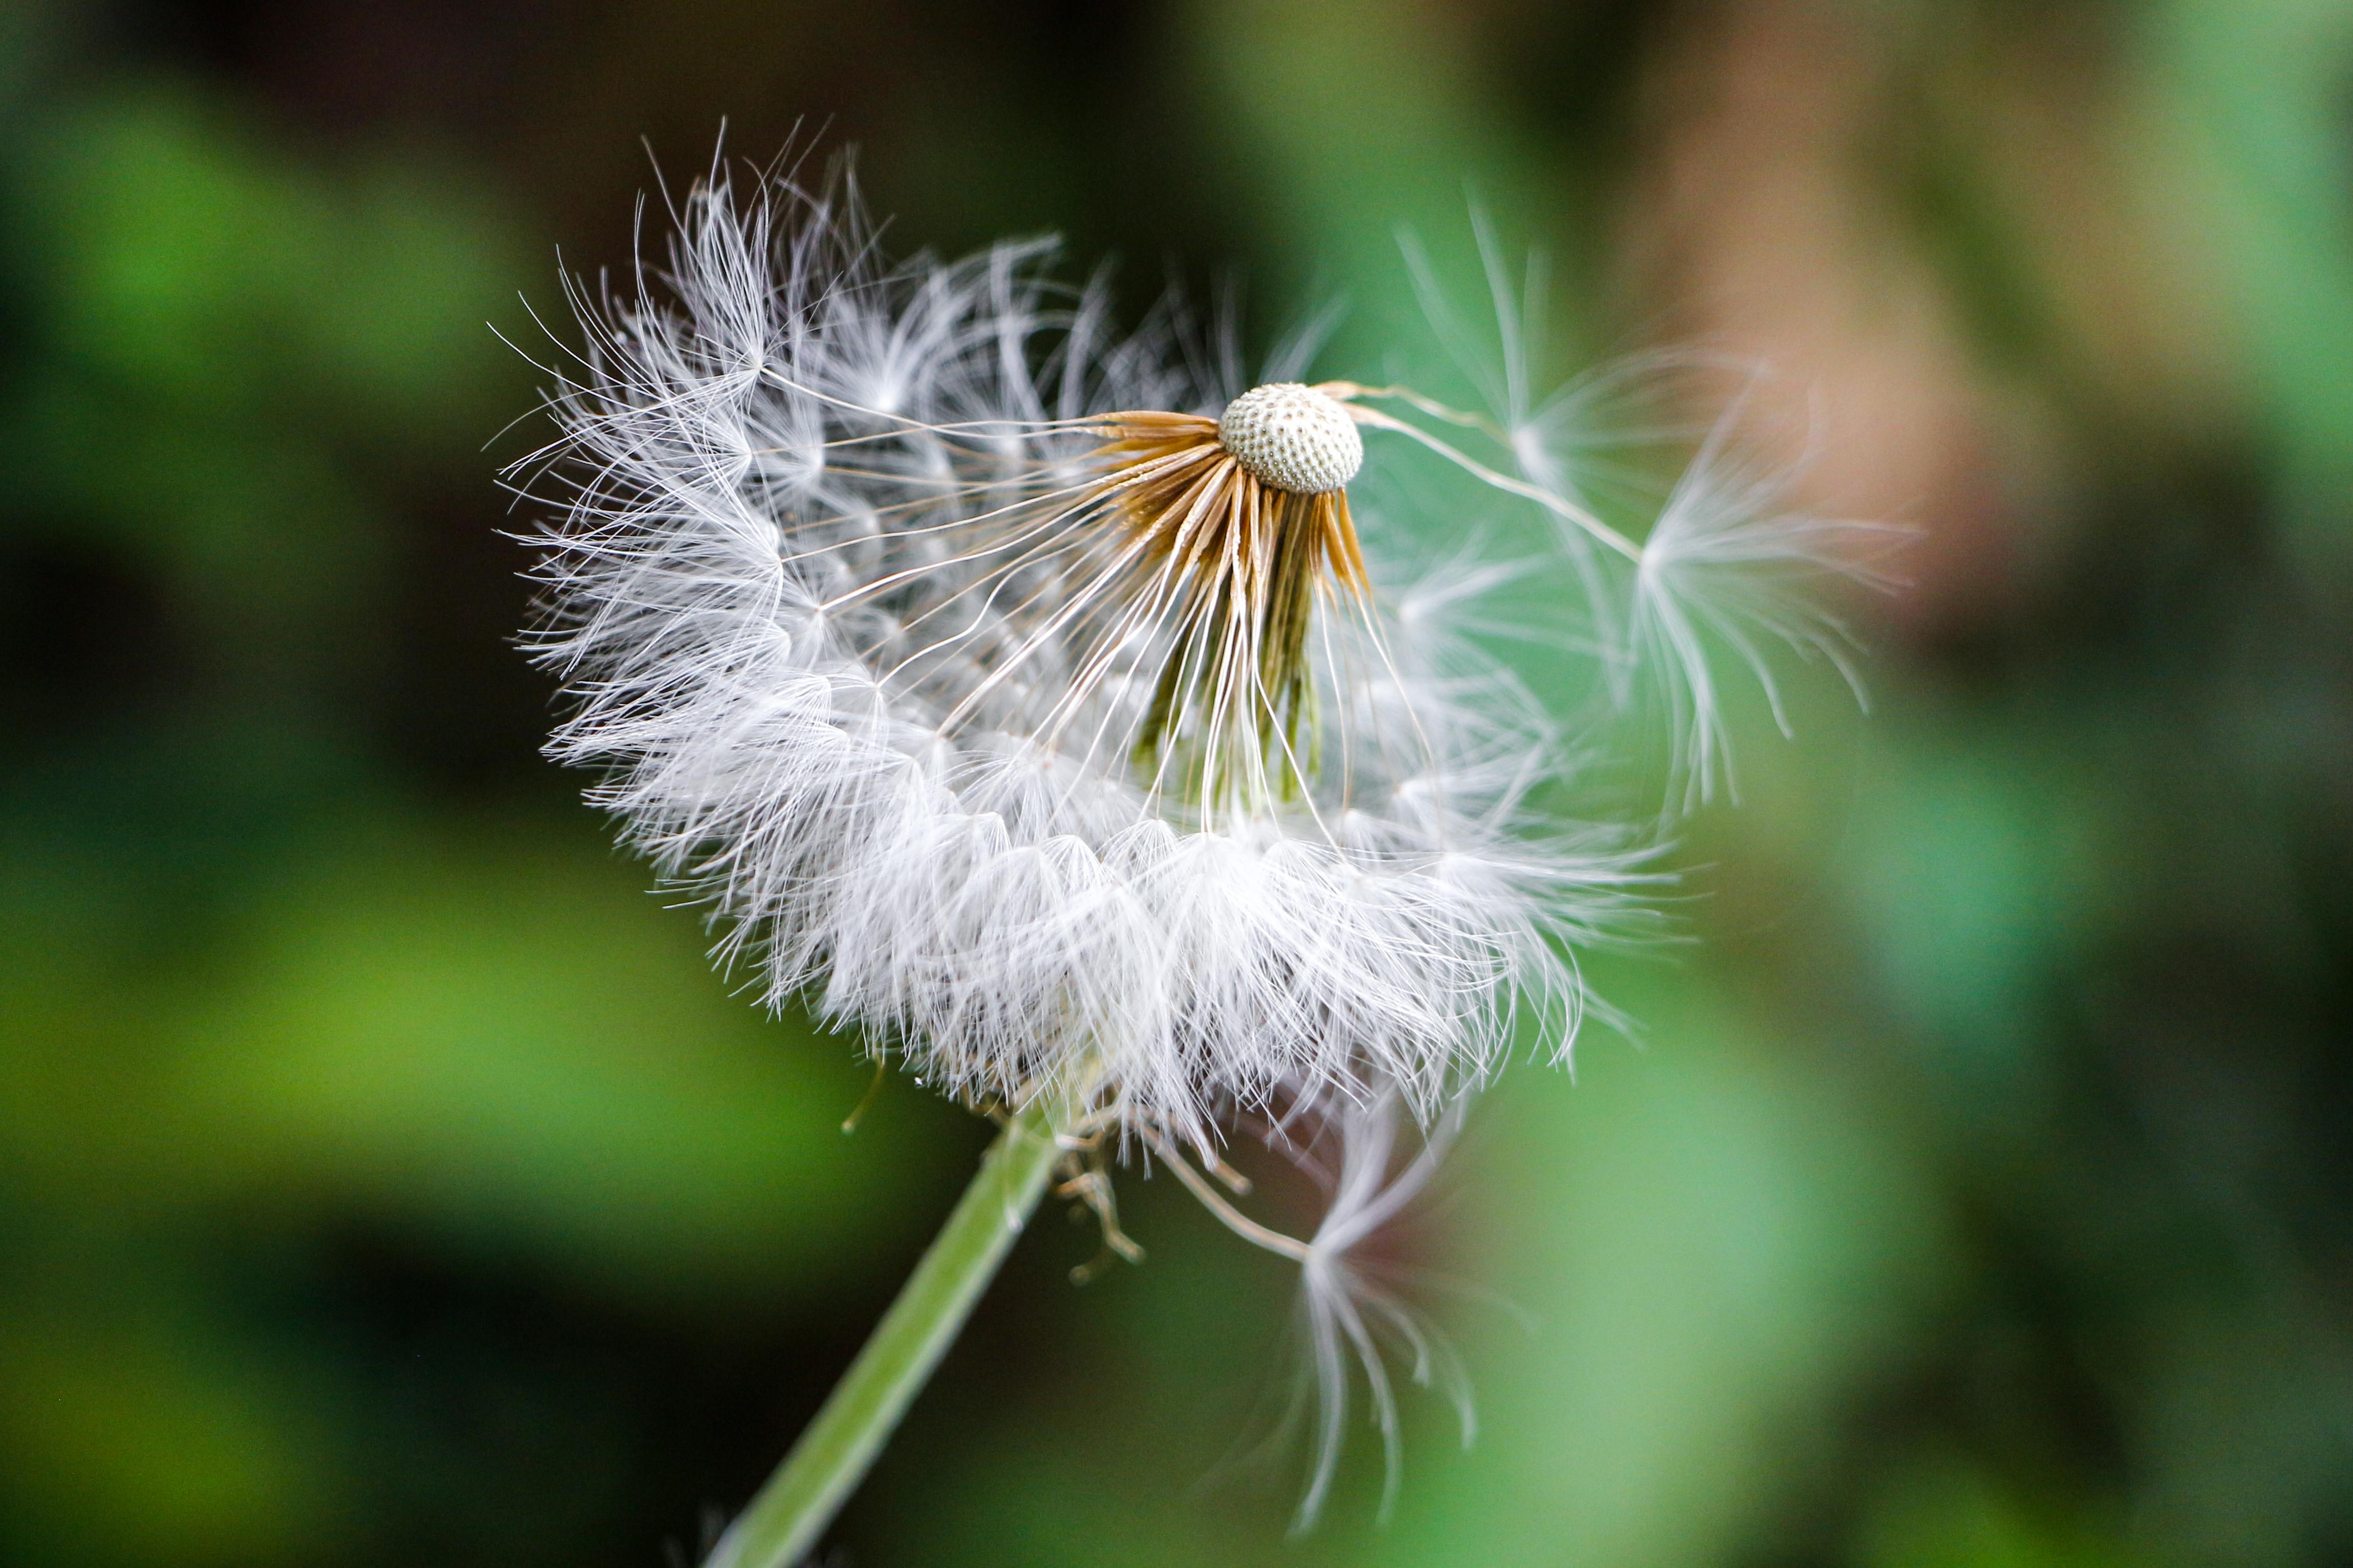 Flor dente de leao